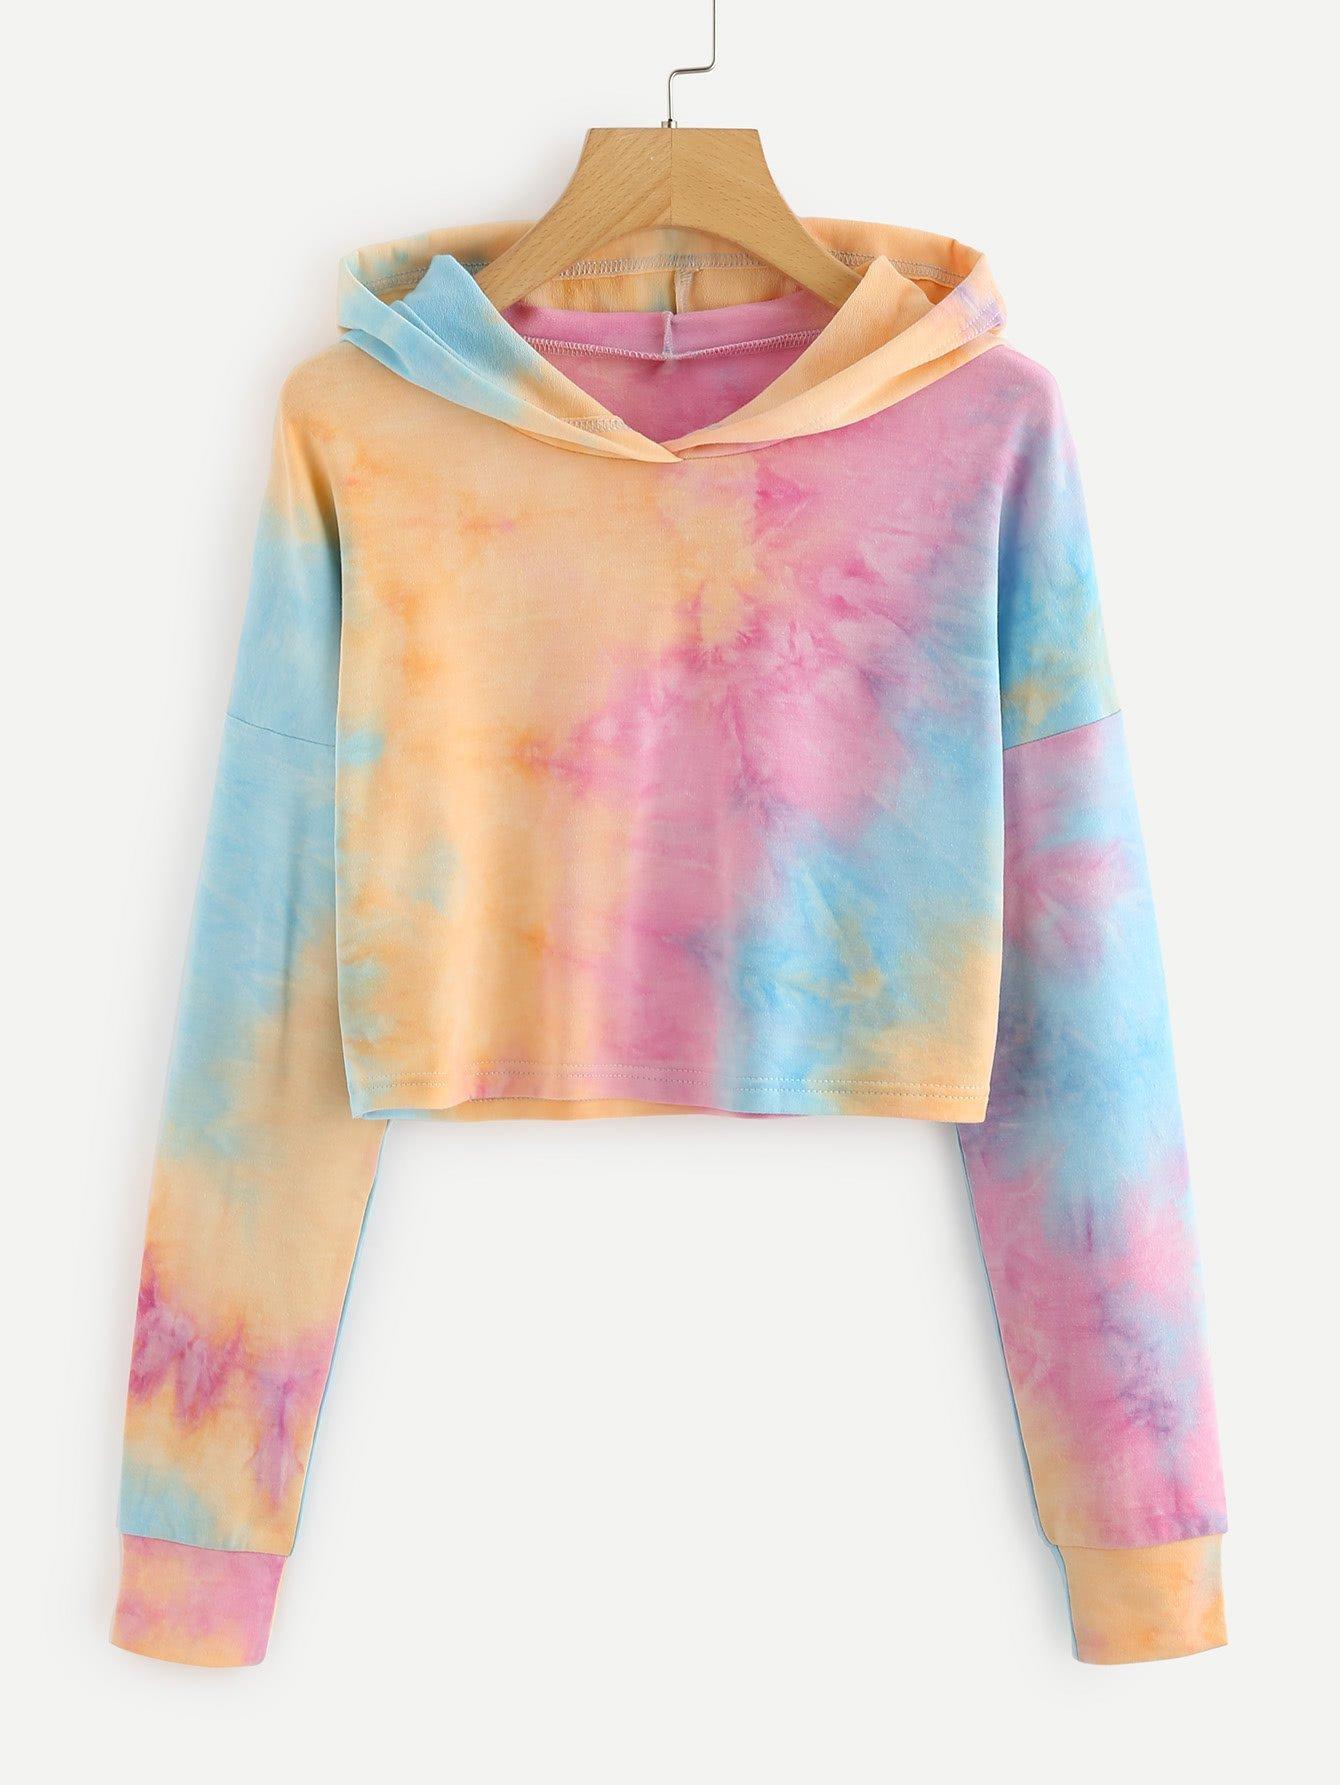 Hoodie Gradient Crop Top Sweatshirt